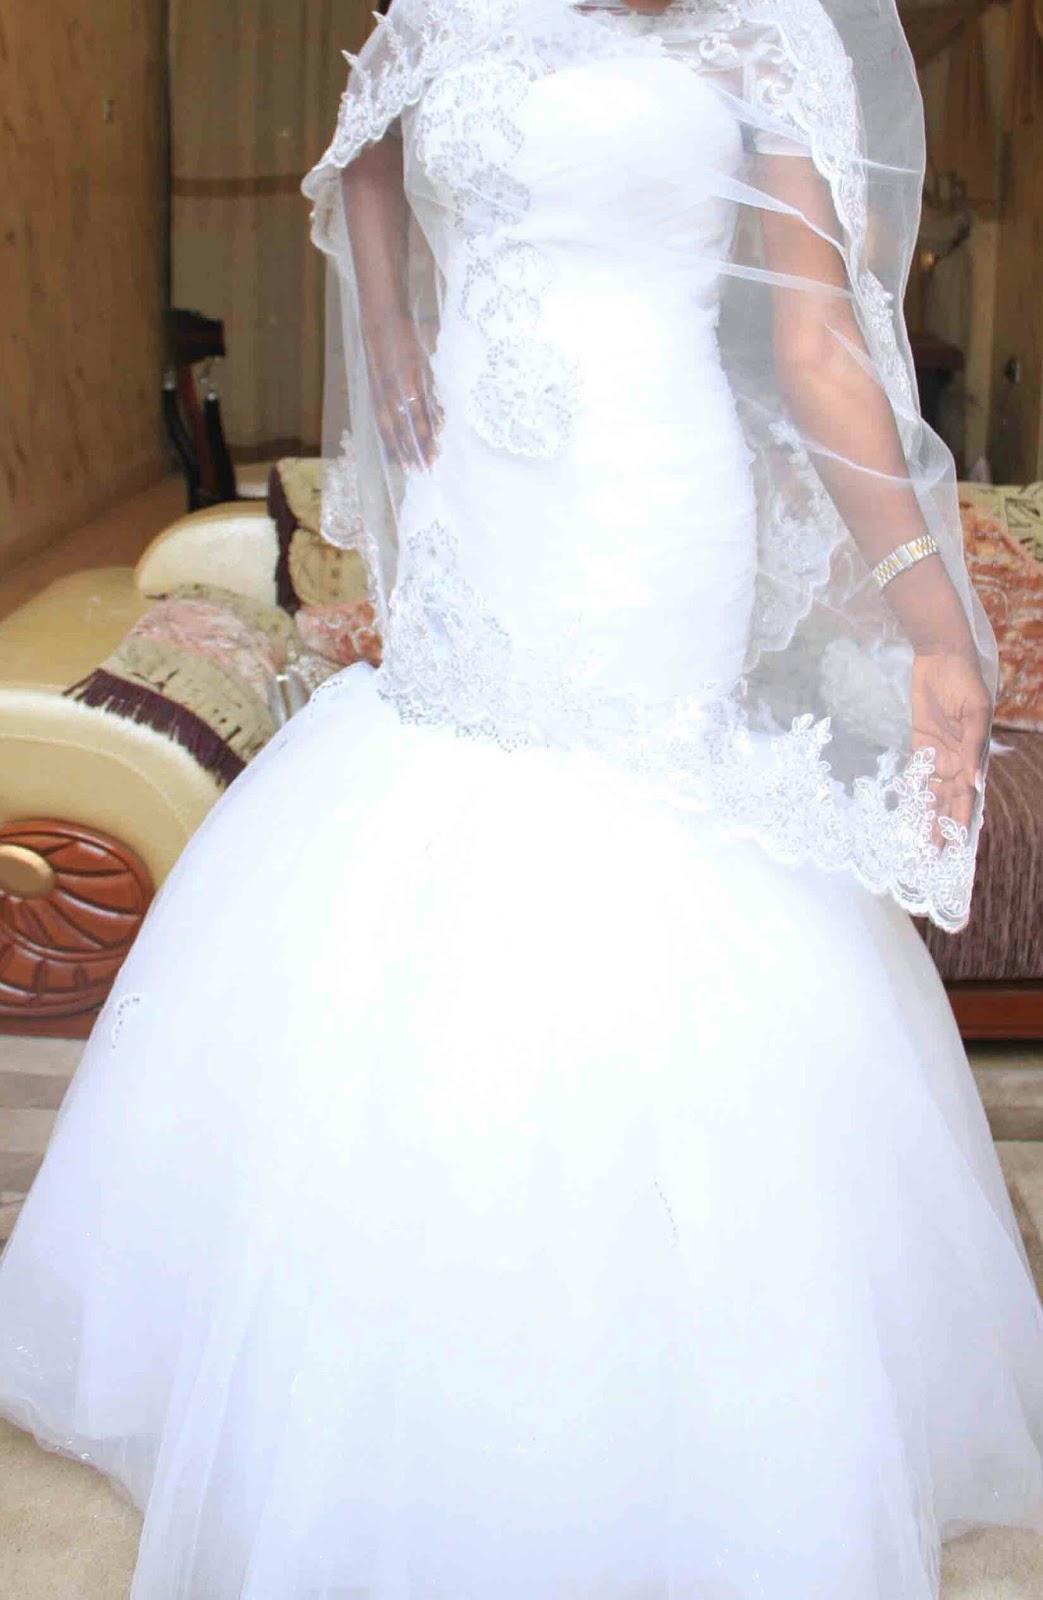 Wedding Dress Buyers 11 Popular Its a very beautiful